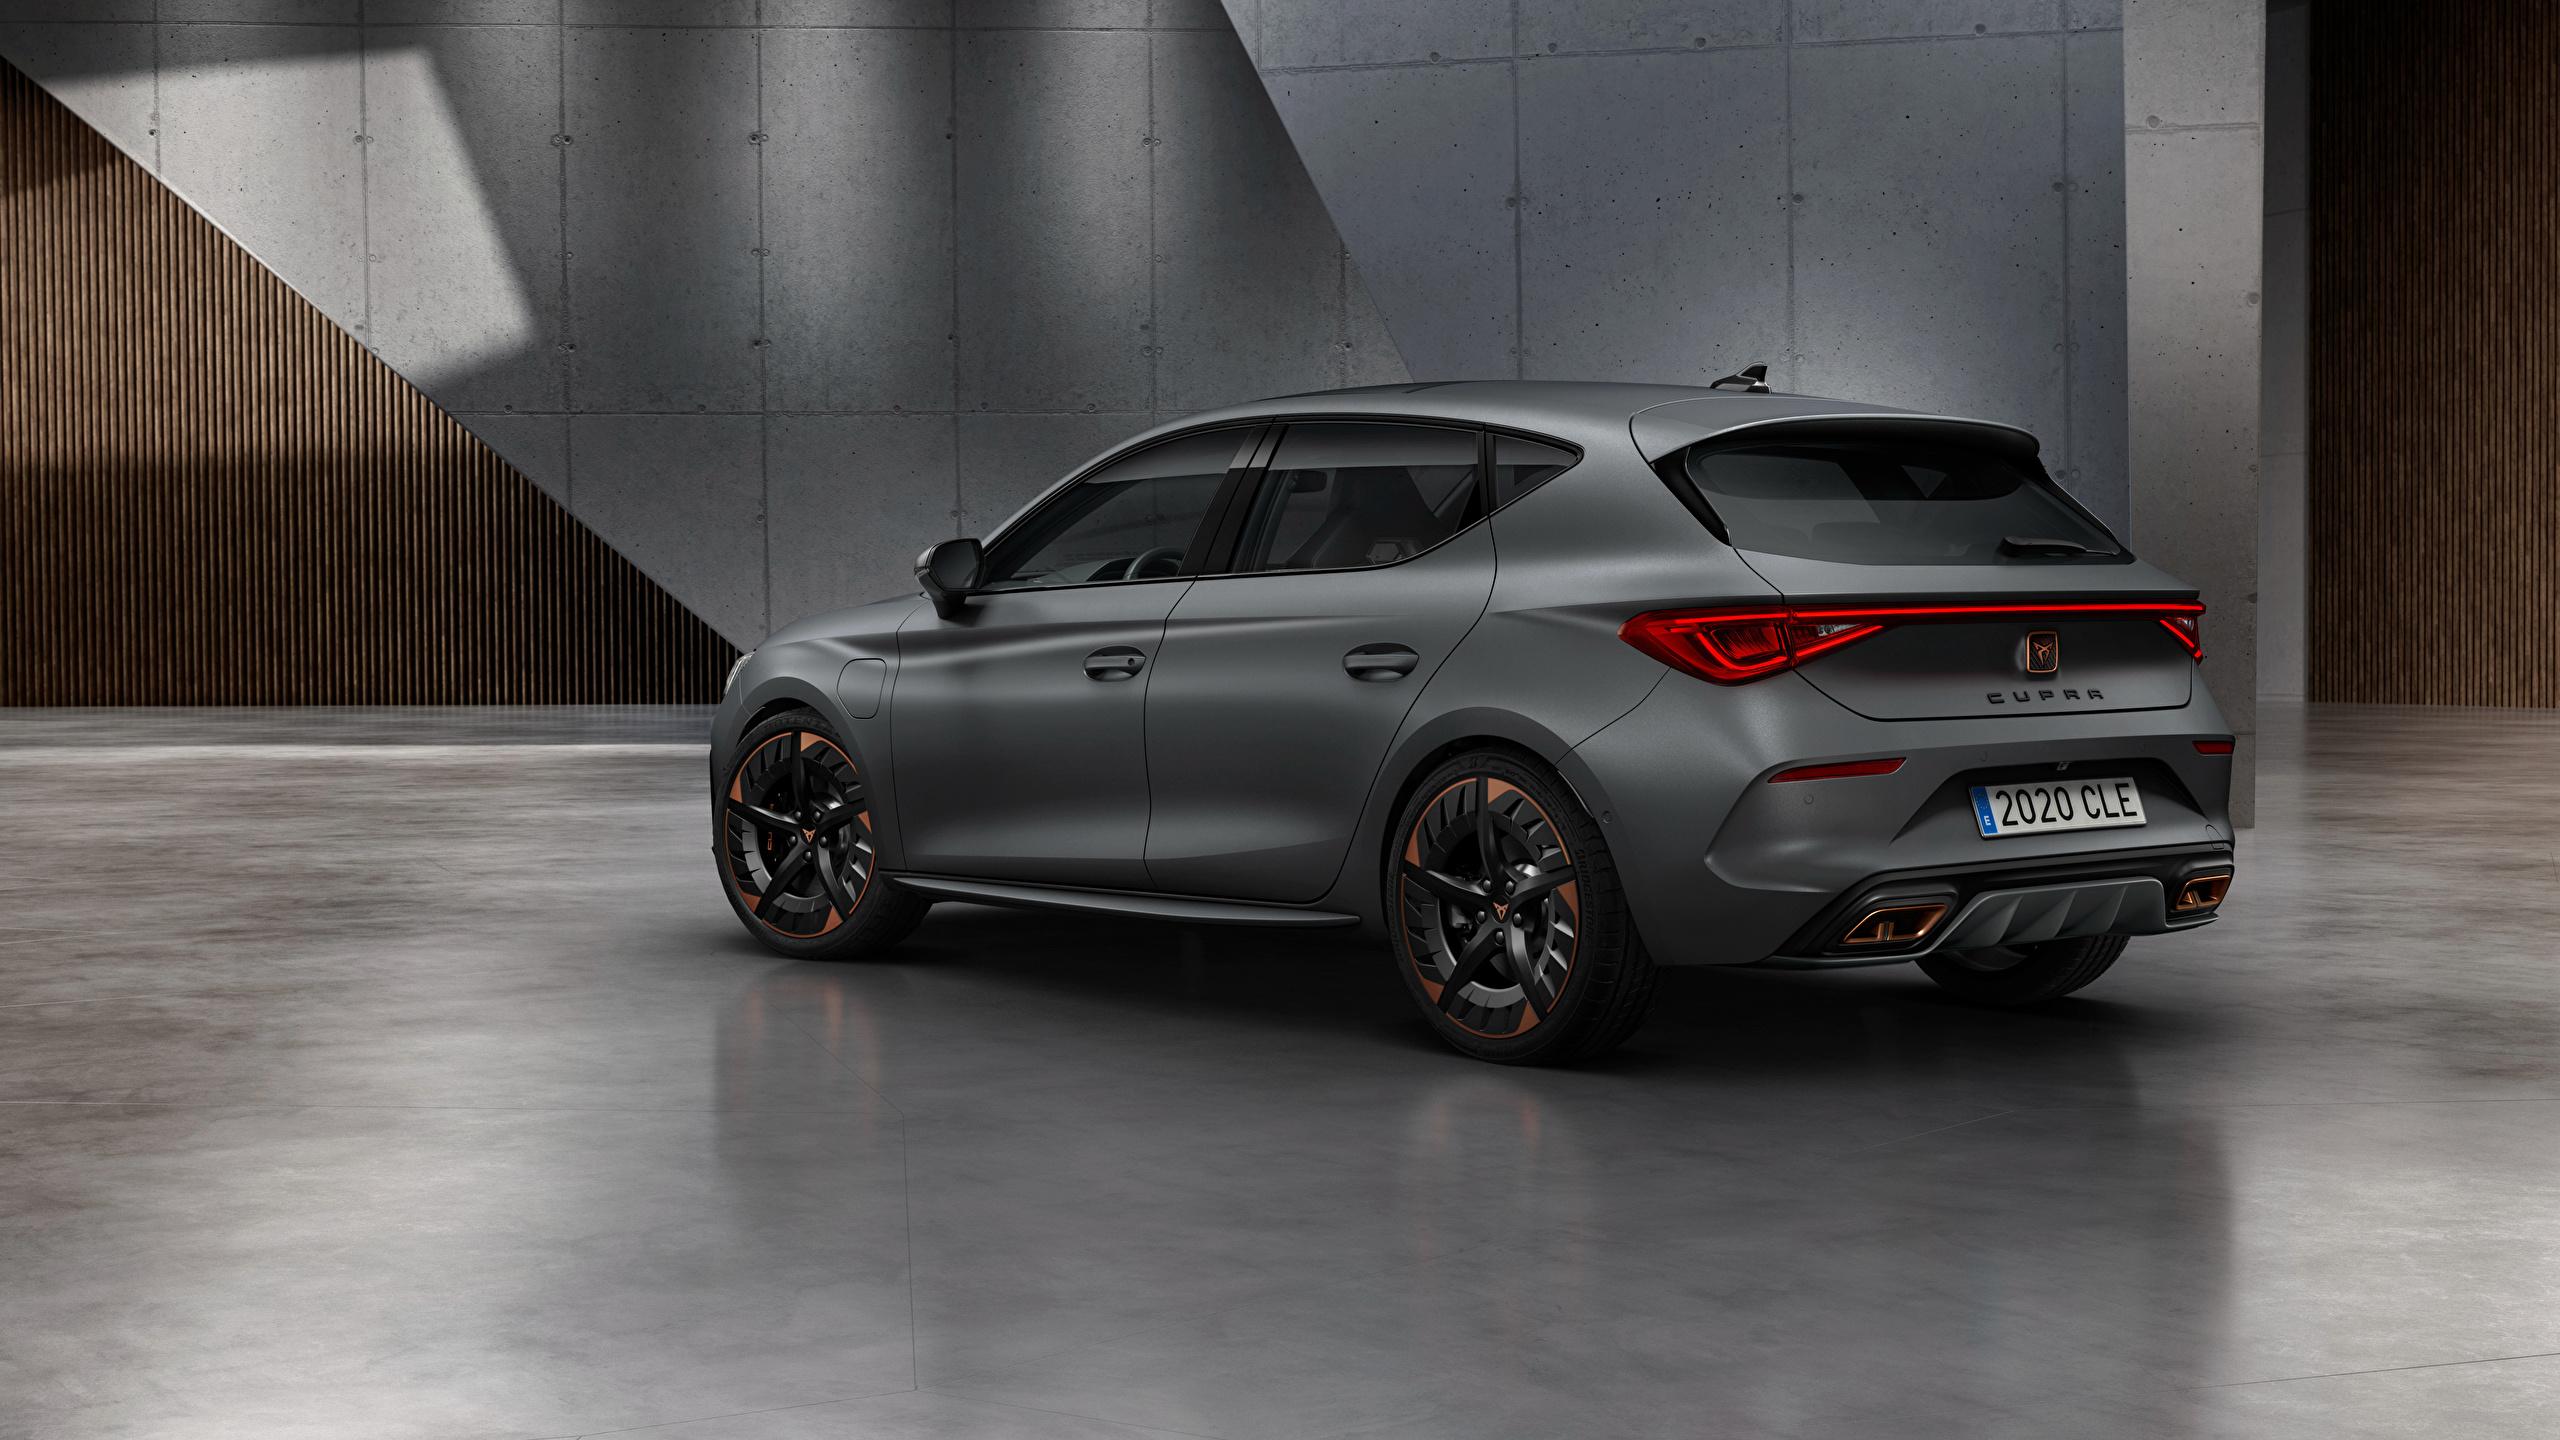 Foto Seat Cupra, Leon, eHybrid, Worldwide, 2020 graues Autos Seitlich 2560x1440 Grau graue auto automobil